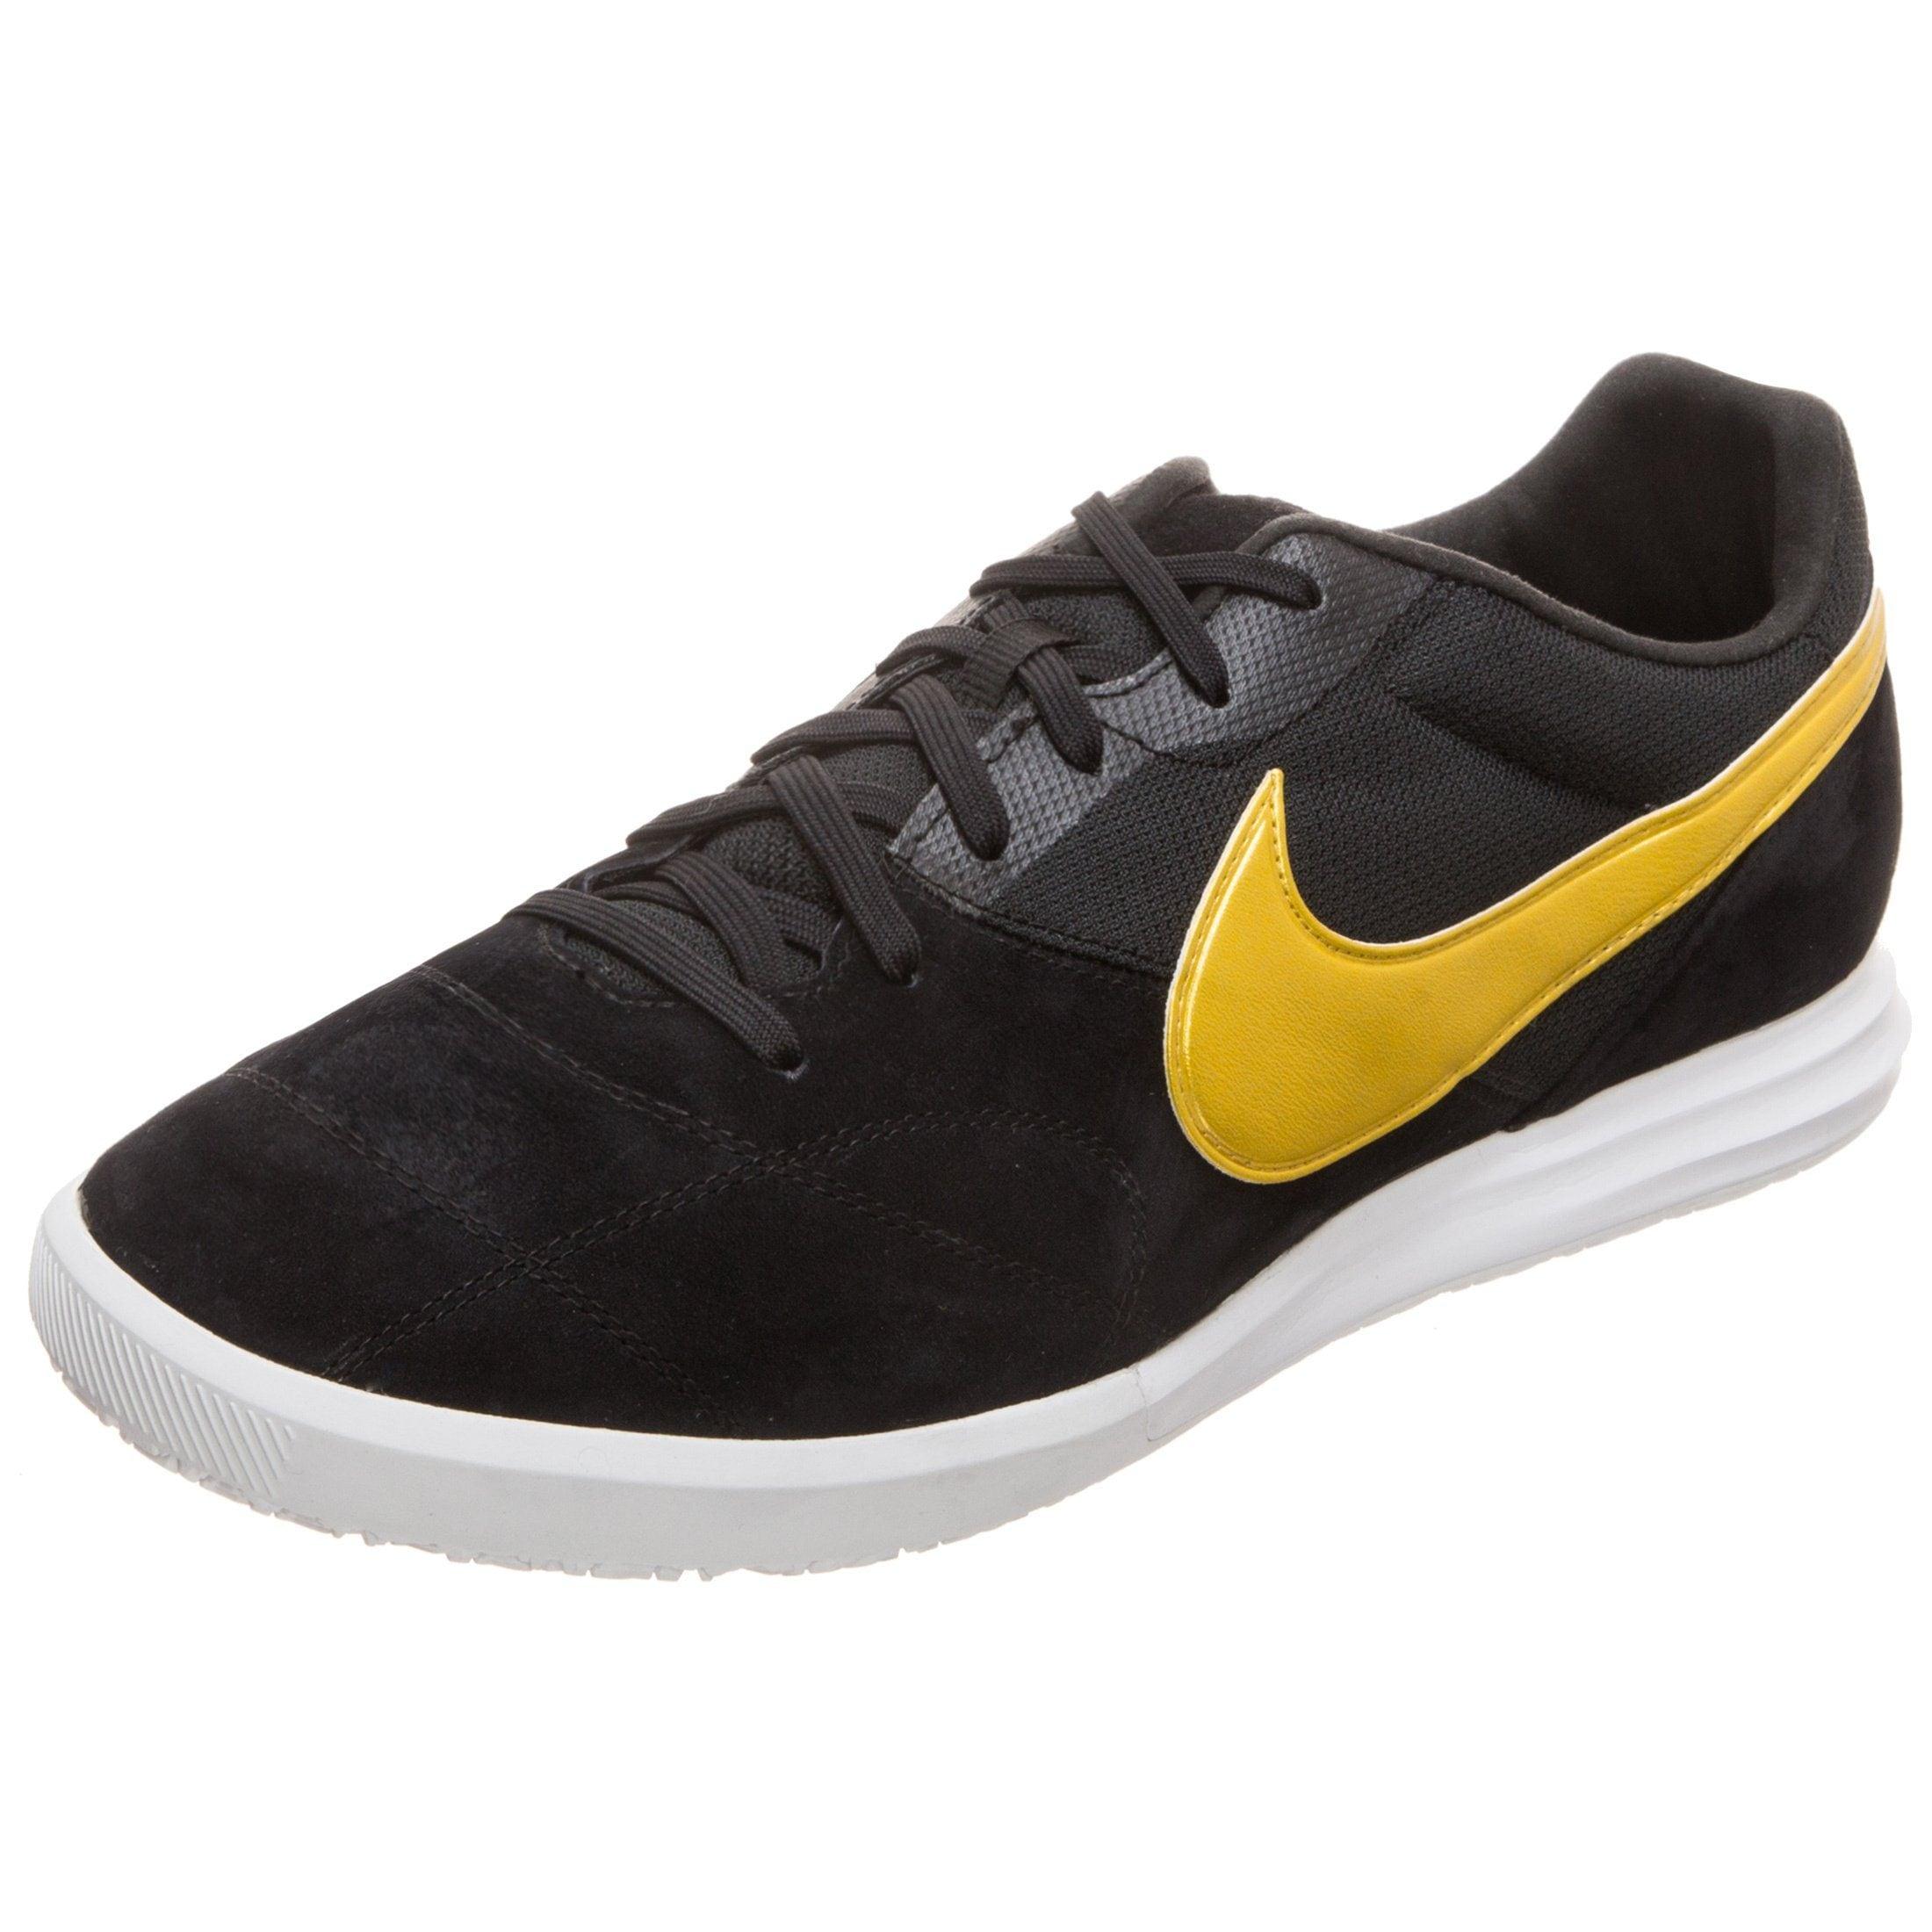 Nike Fußballschuh Premier Ii Sala | Schuhe > Sportschuhe > Fußballschuhe | Schwarz | Nike